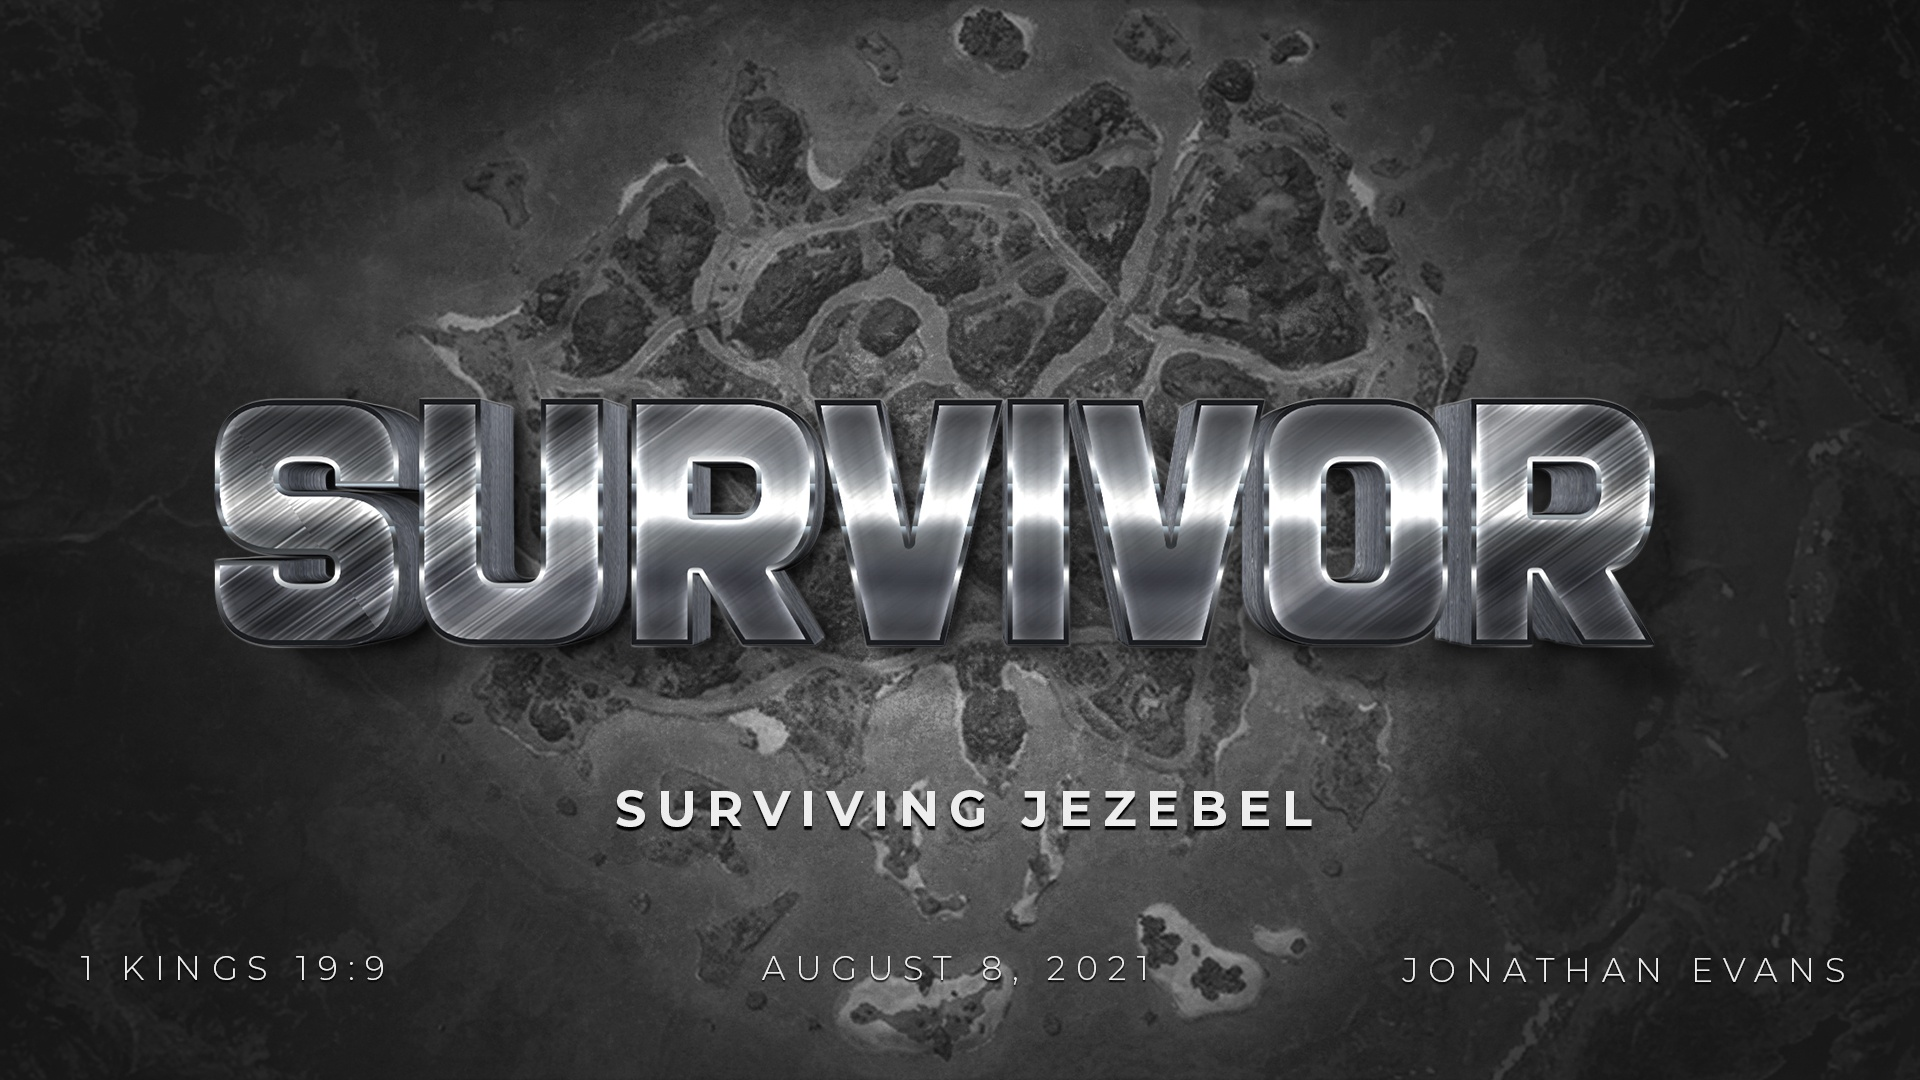 Survivor: Surviving Jezebel by Jonathan Evans